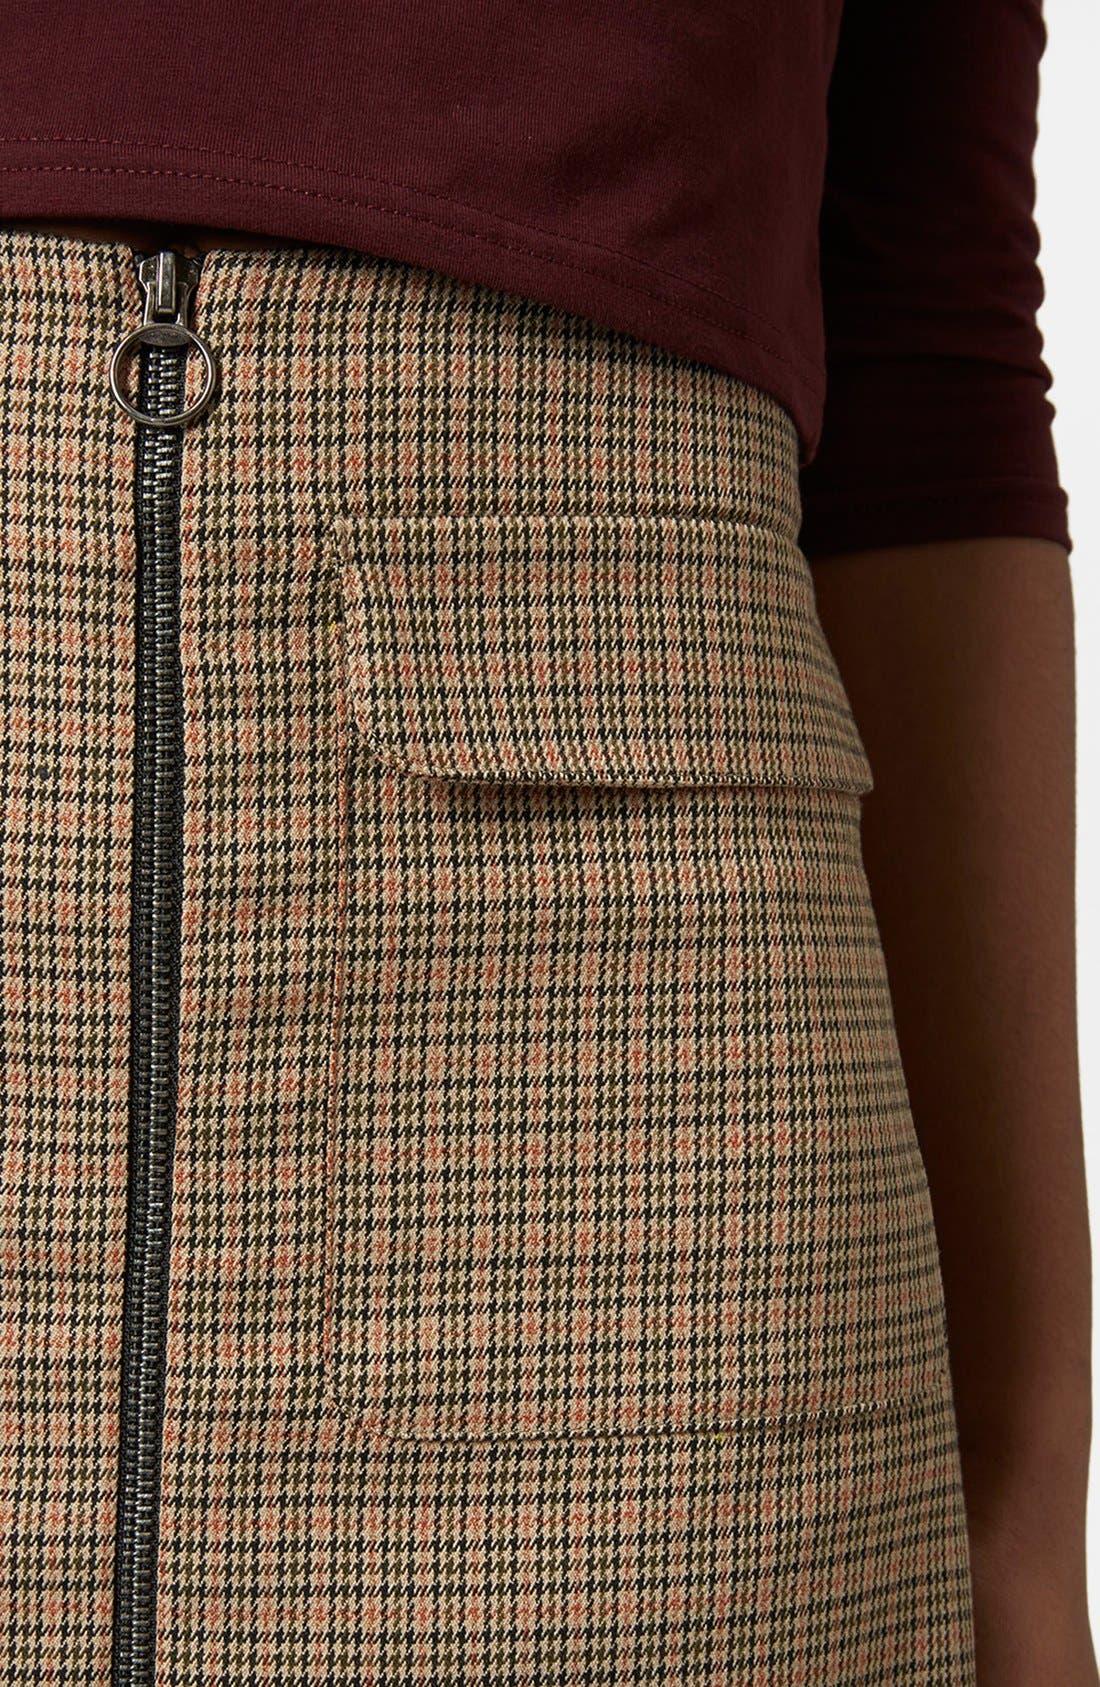 Alternate Image 3  - Topshop 'Tessa' Houndstooth A-Line Miniskirt